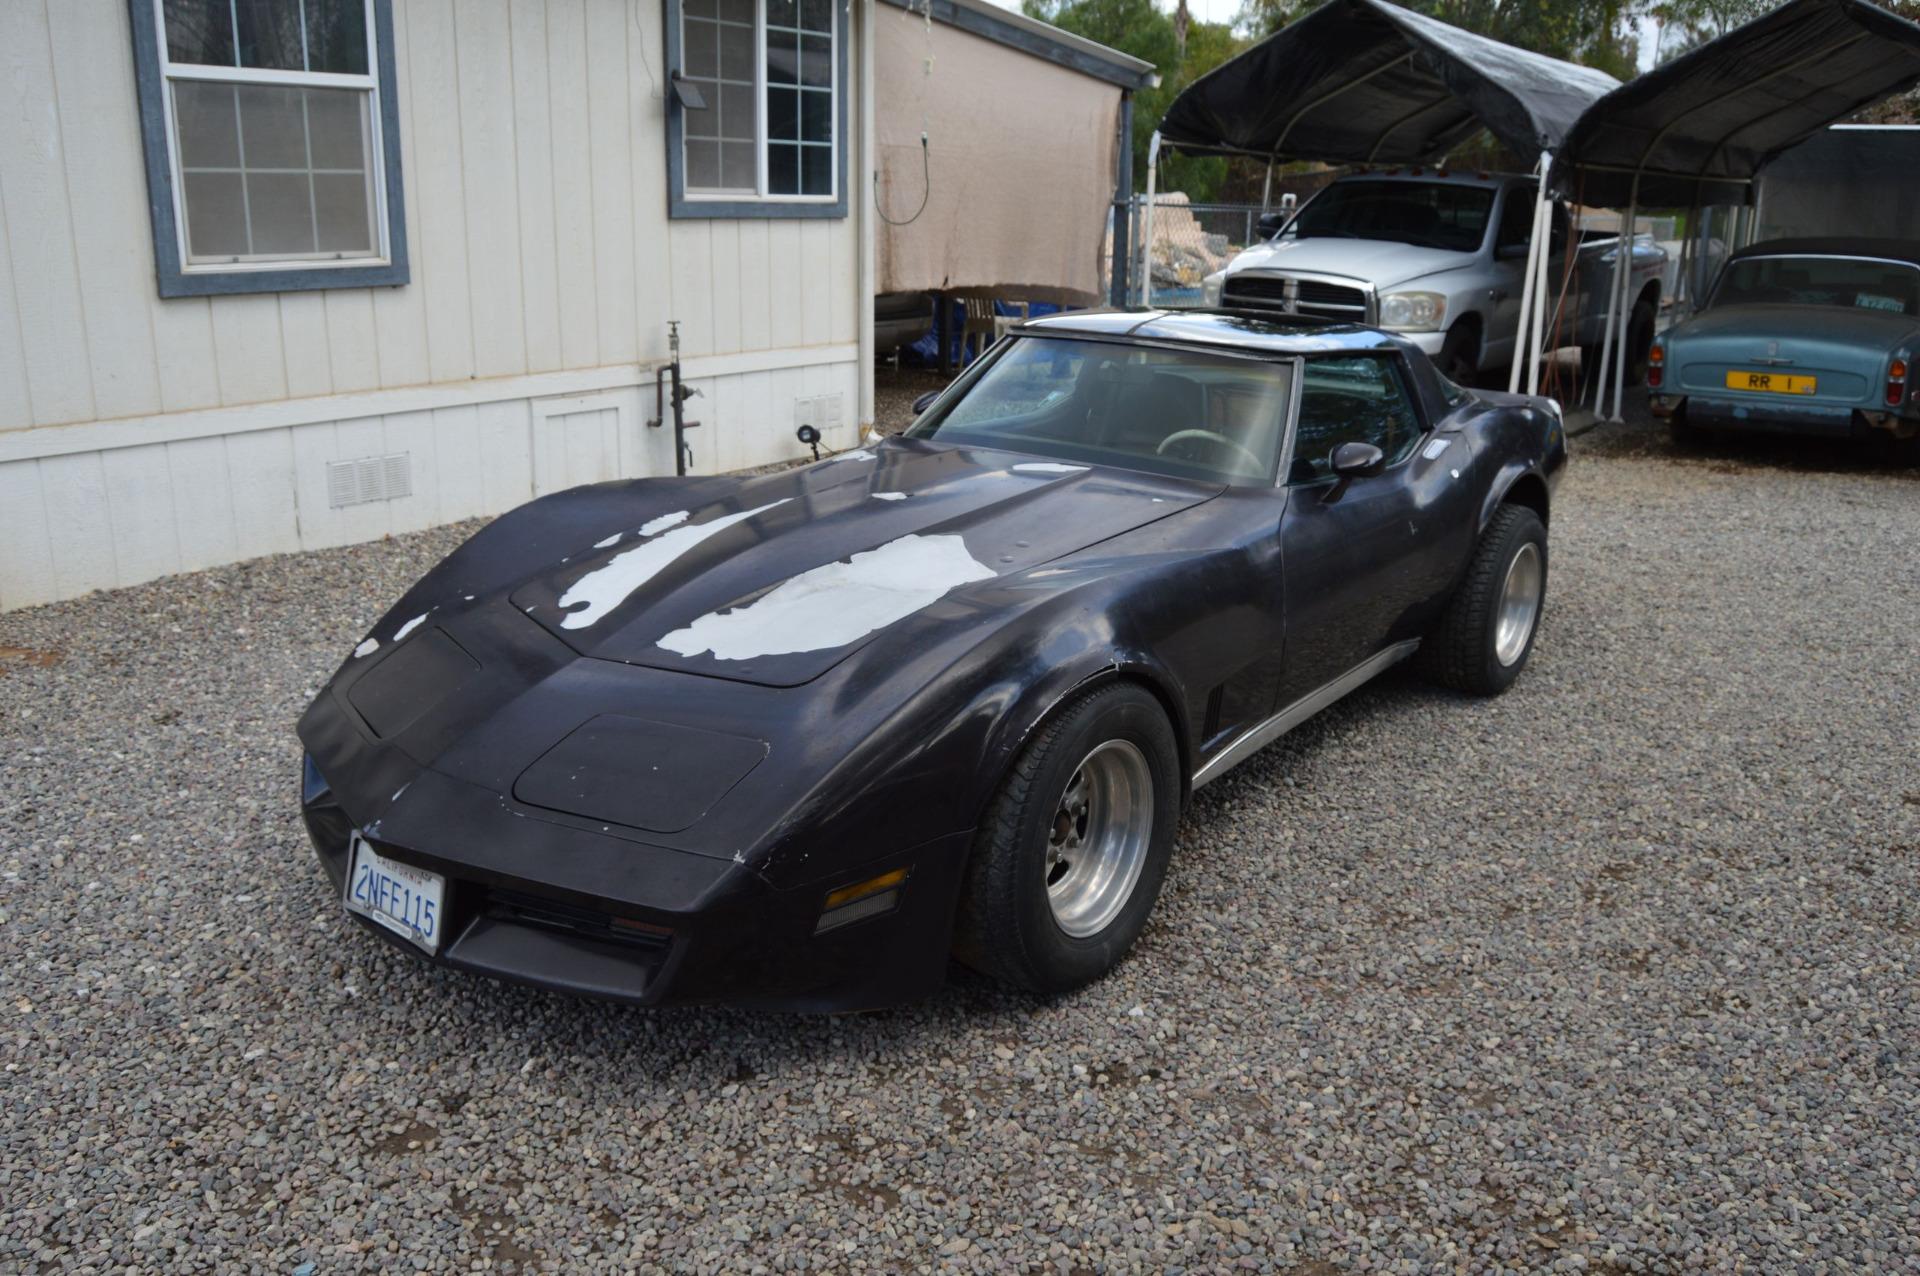 1980 Corvette For Sale >> Used 1980 Chevrolet Corvette For Sale 4 500 Affordable